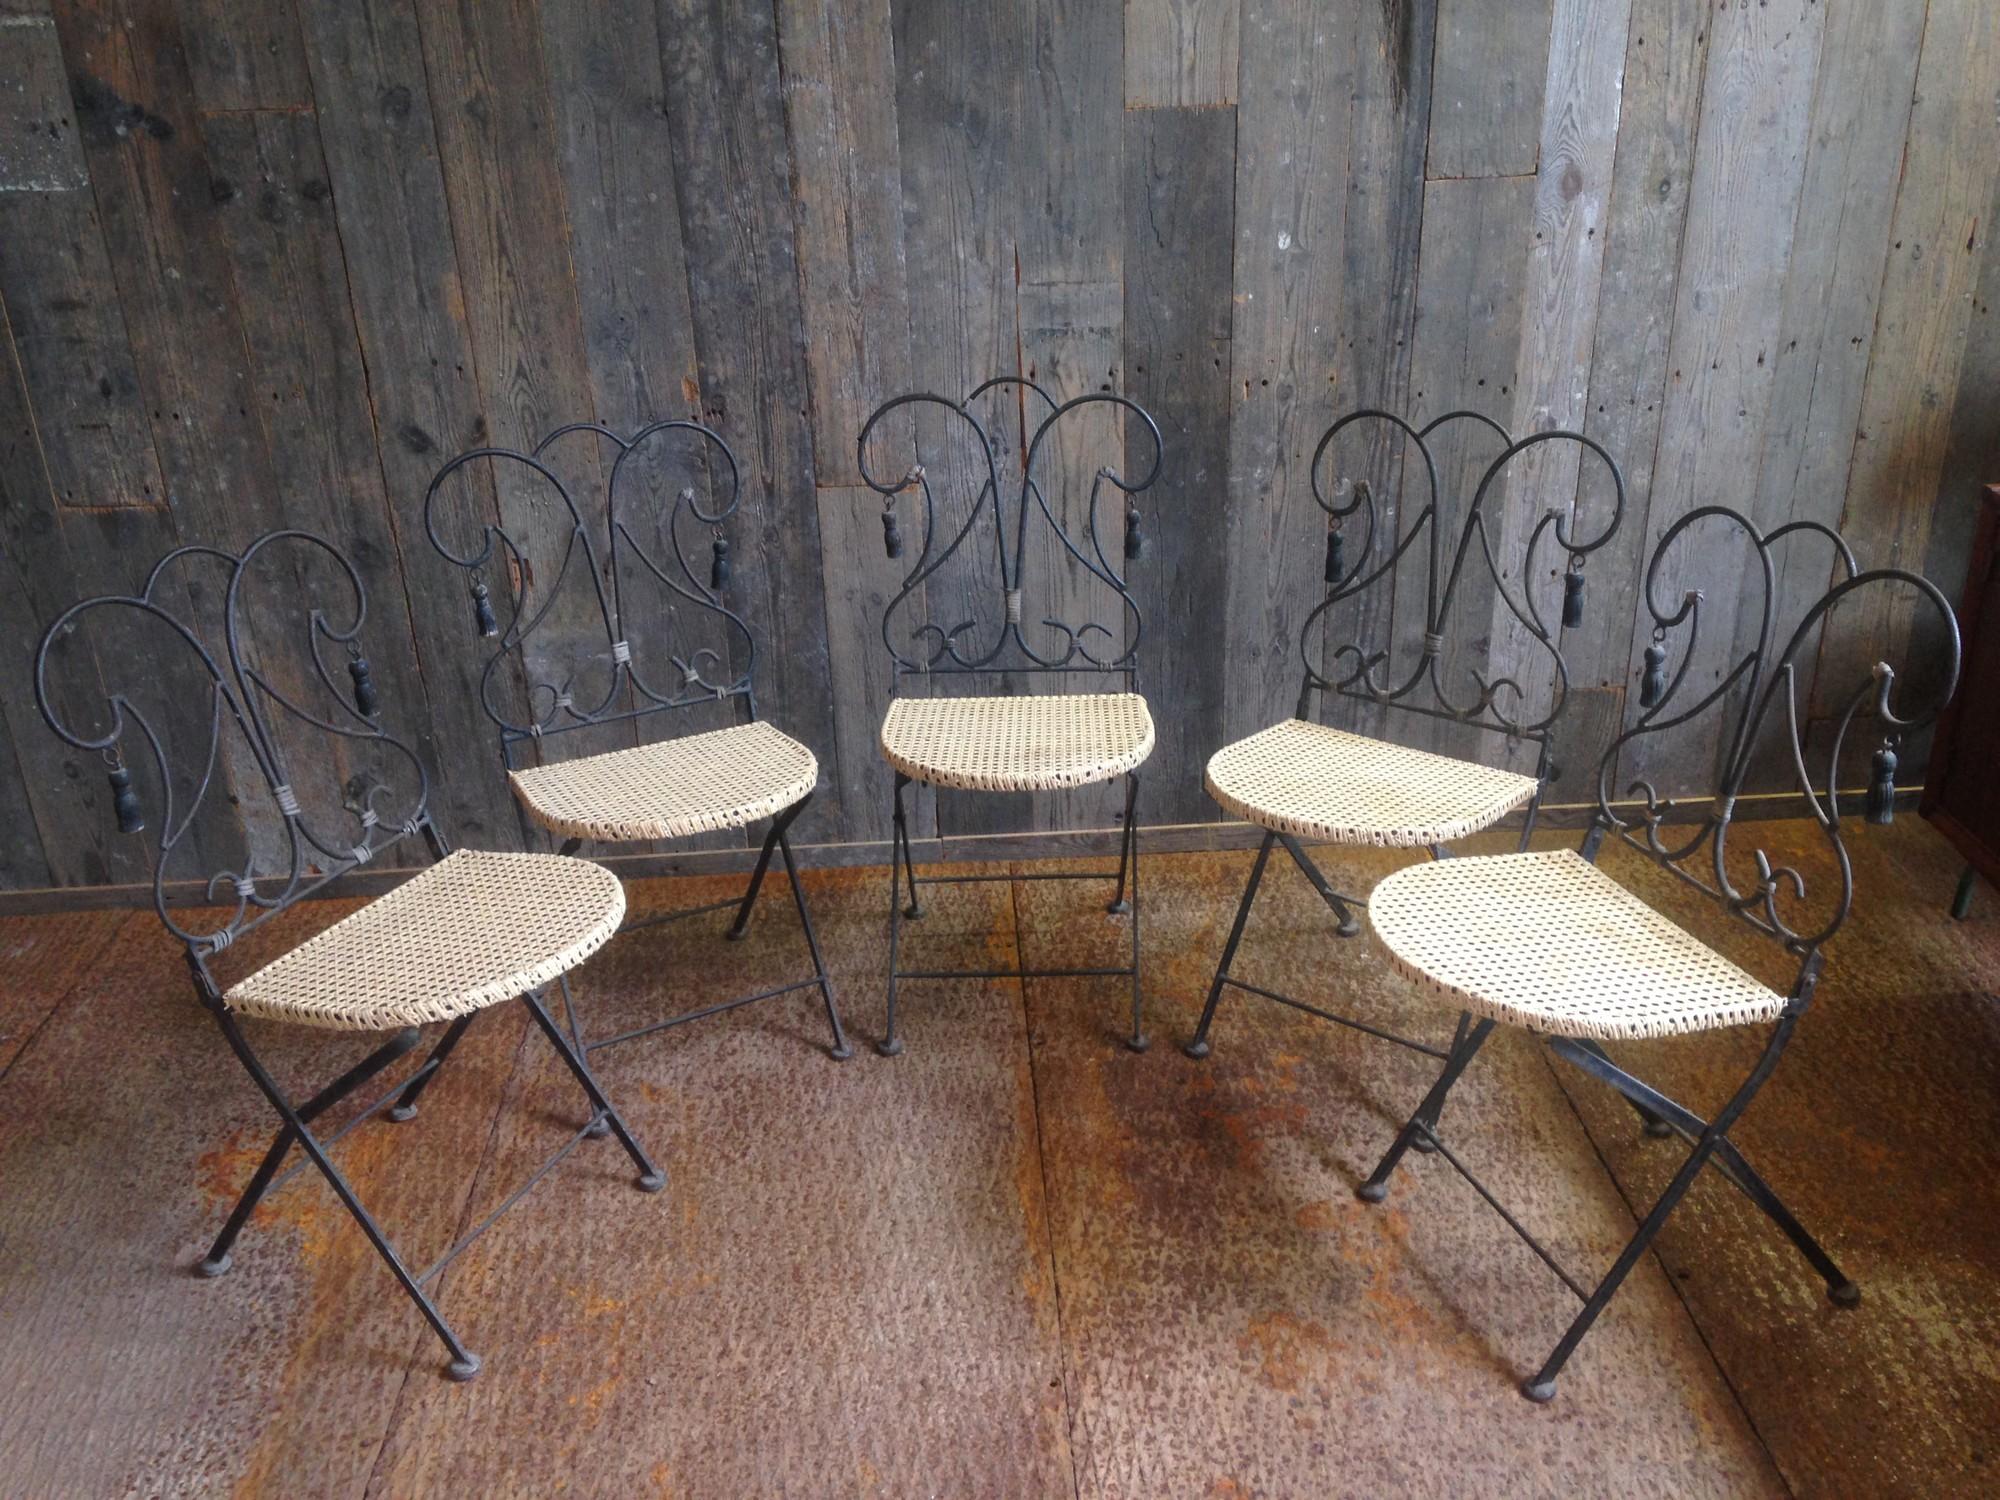 5 stuks sierlijke vintage klapstoelen